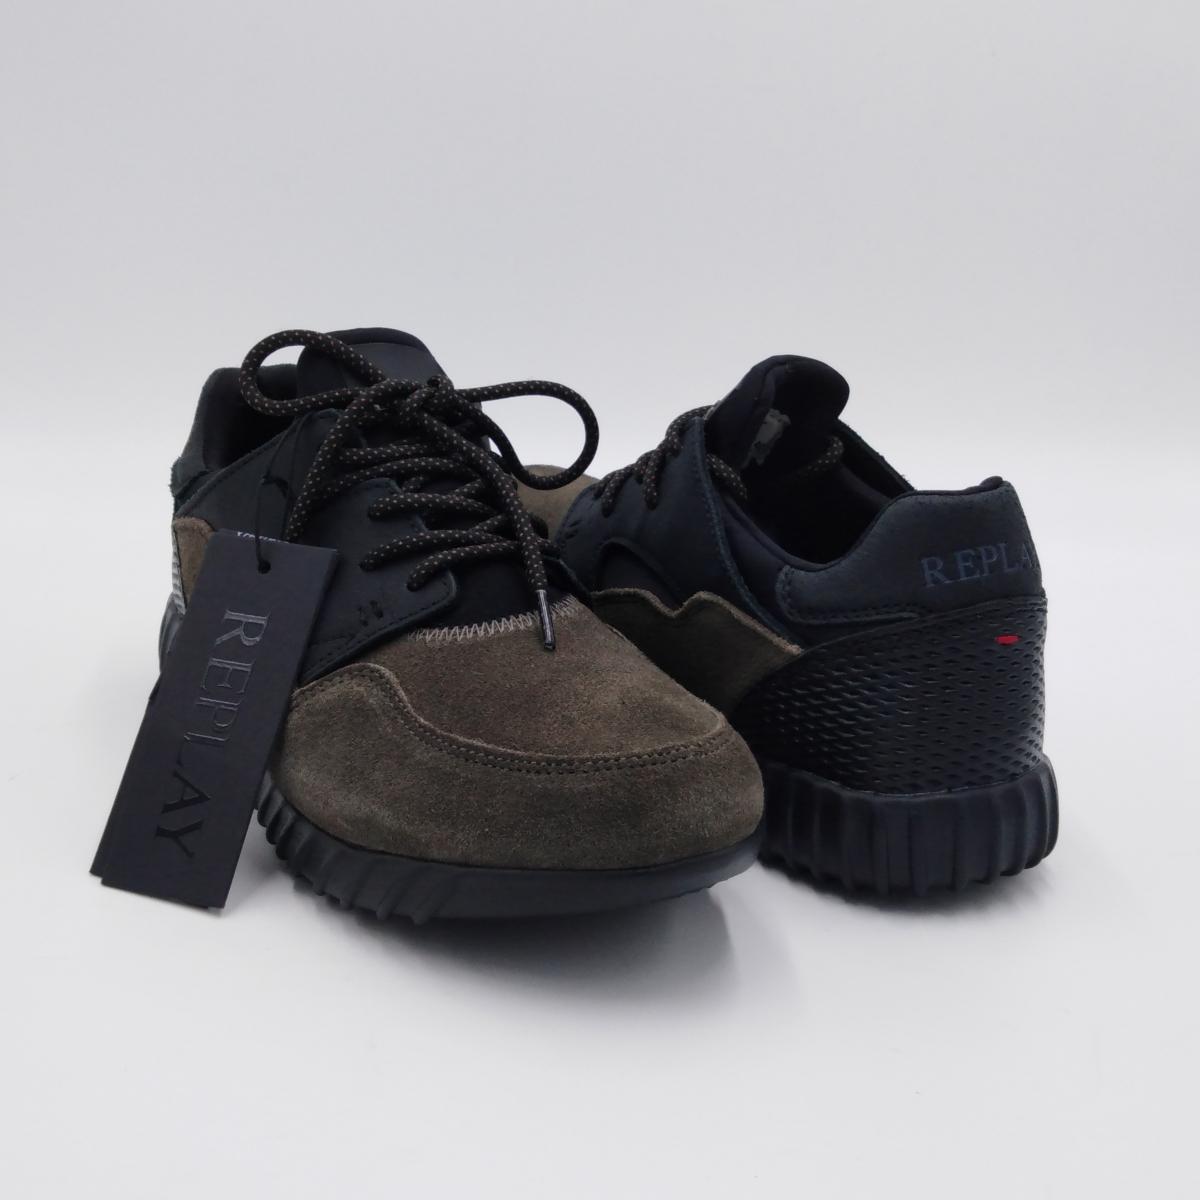 Replay -Sneaker uomo grigio...